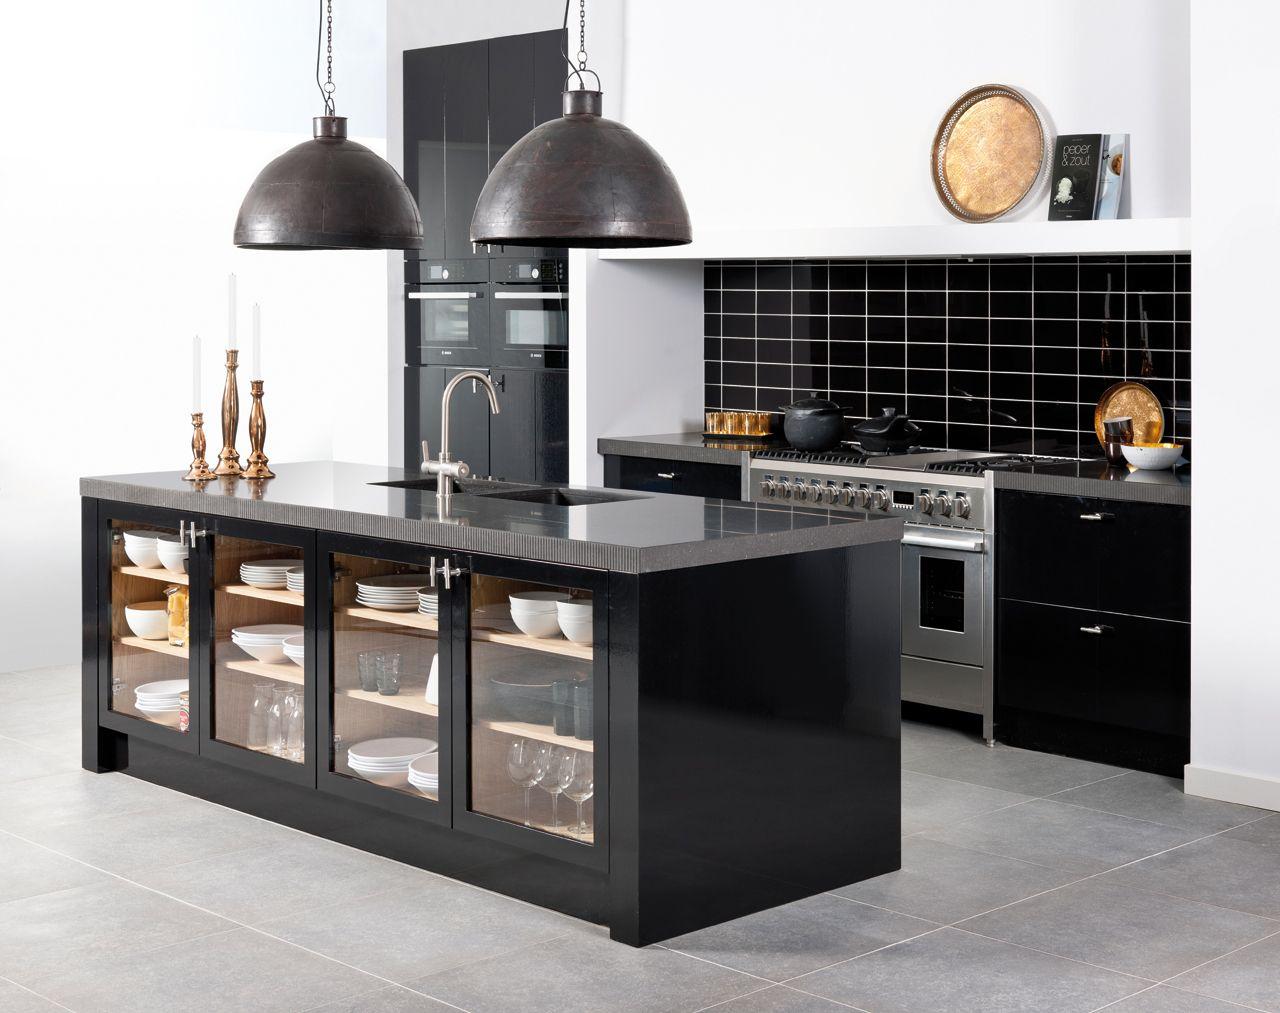 Grando keukens model porzio keukens kookeilanden gespot door